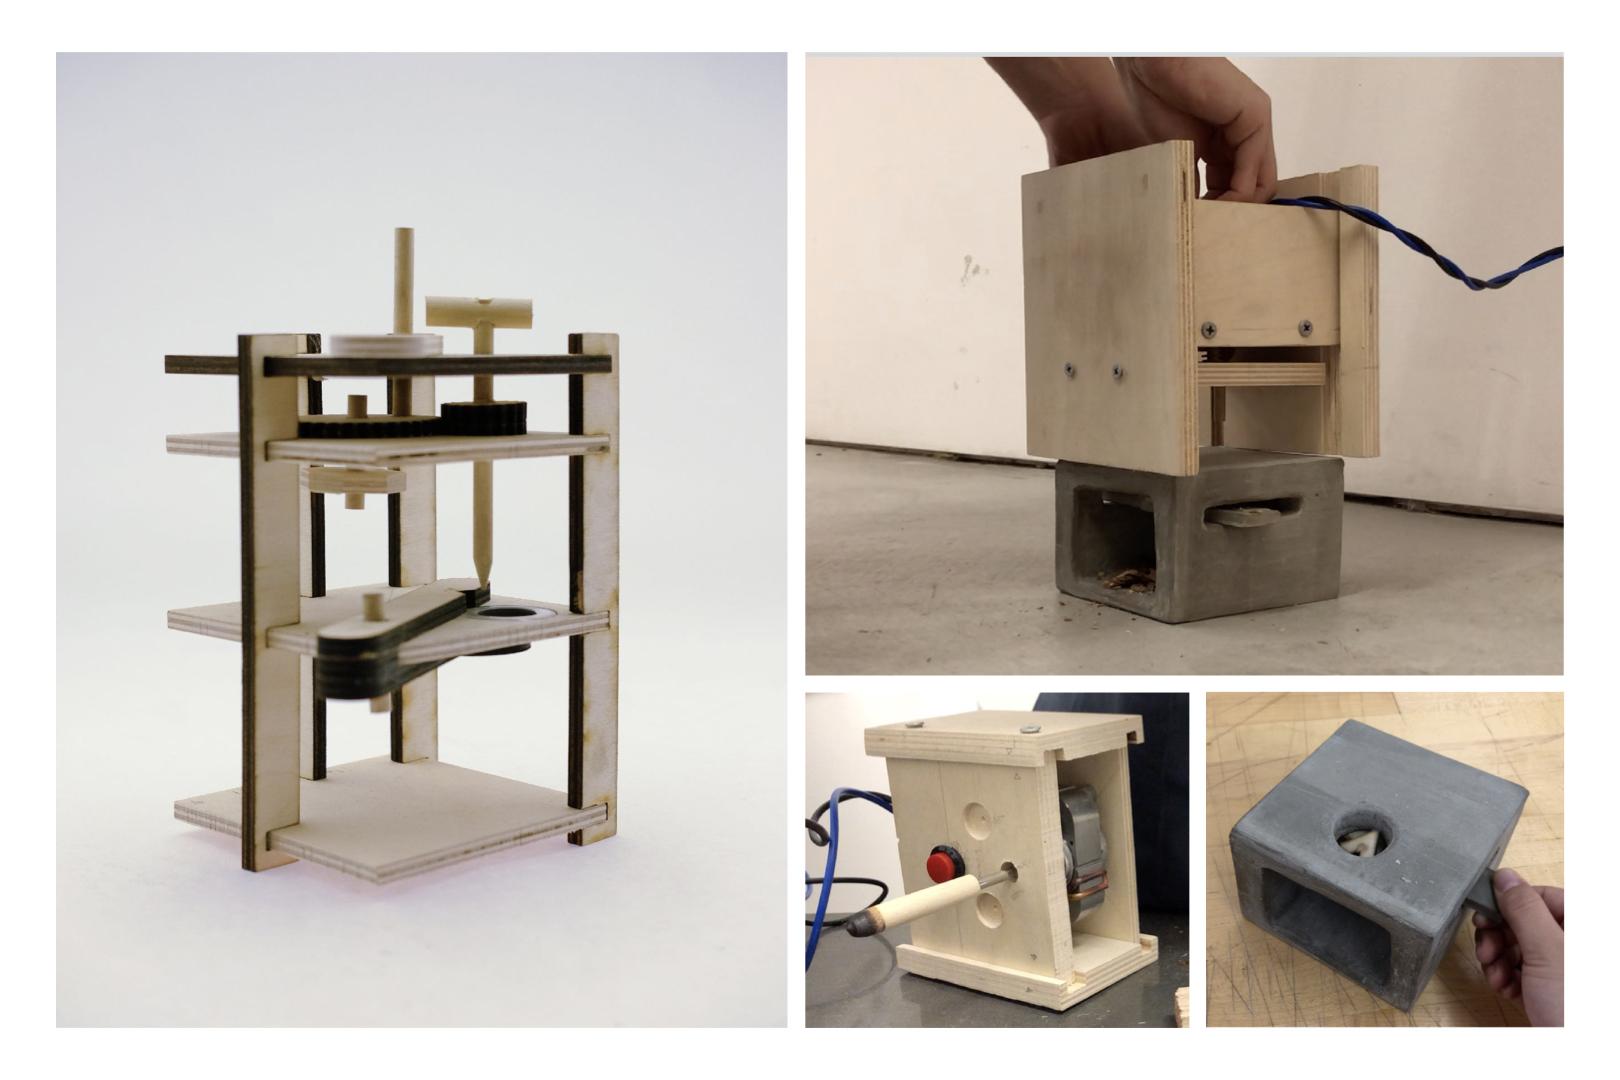 fire-starter-prototypes